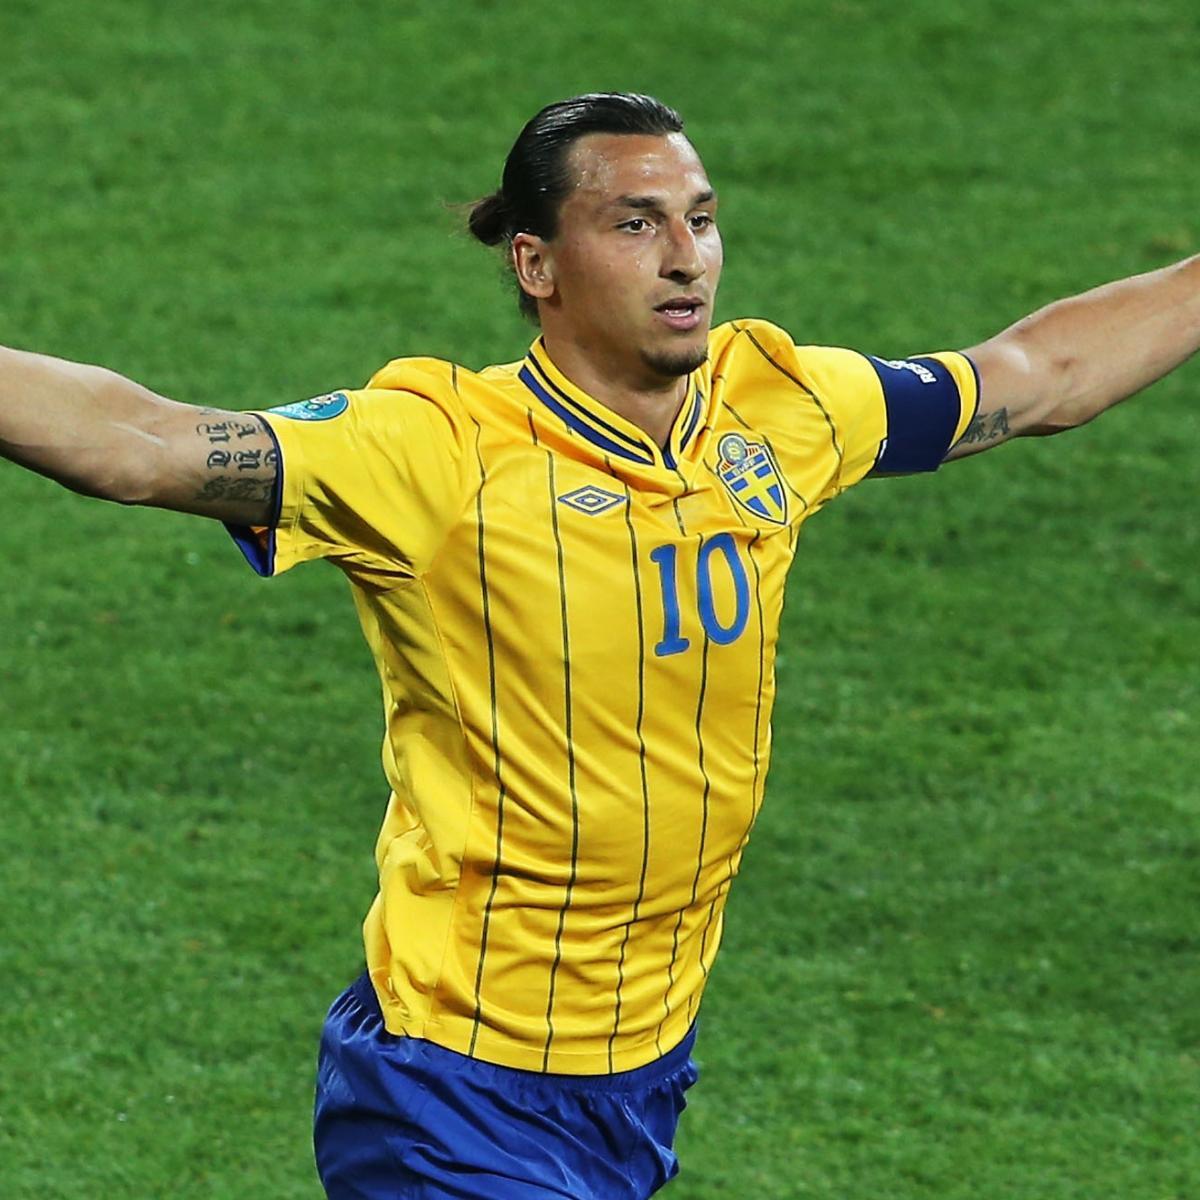 Wondergoal By Zlatan: Zlatan Ibrahimovic Calls Himself God Ahead Of World Cup